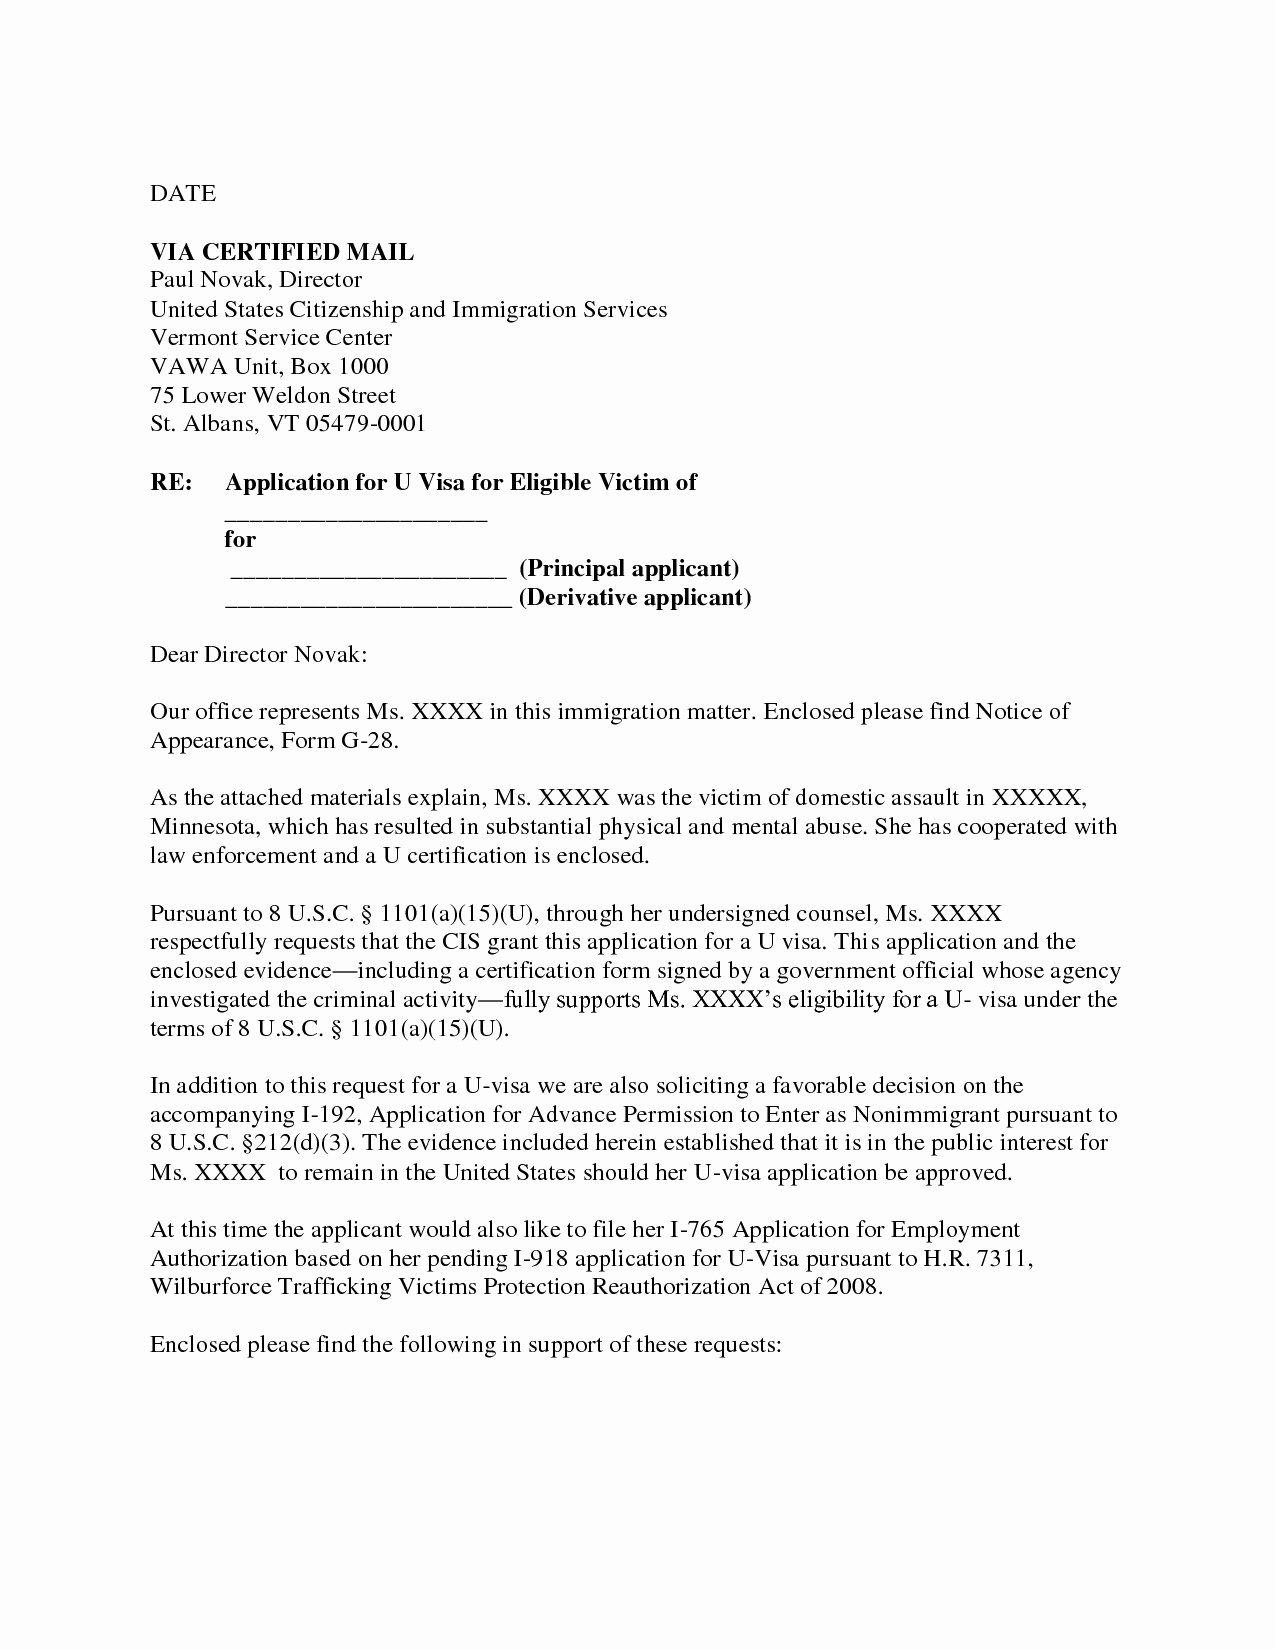 U Visa Personal Statement Sample Unique Letter Example Waiver Letter for Immigration Sample